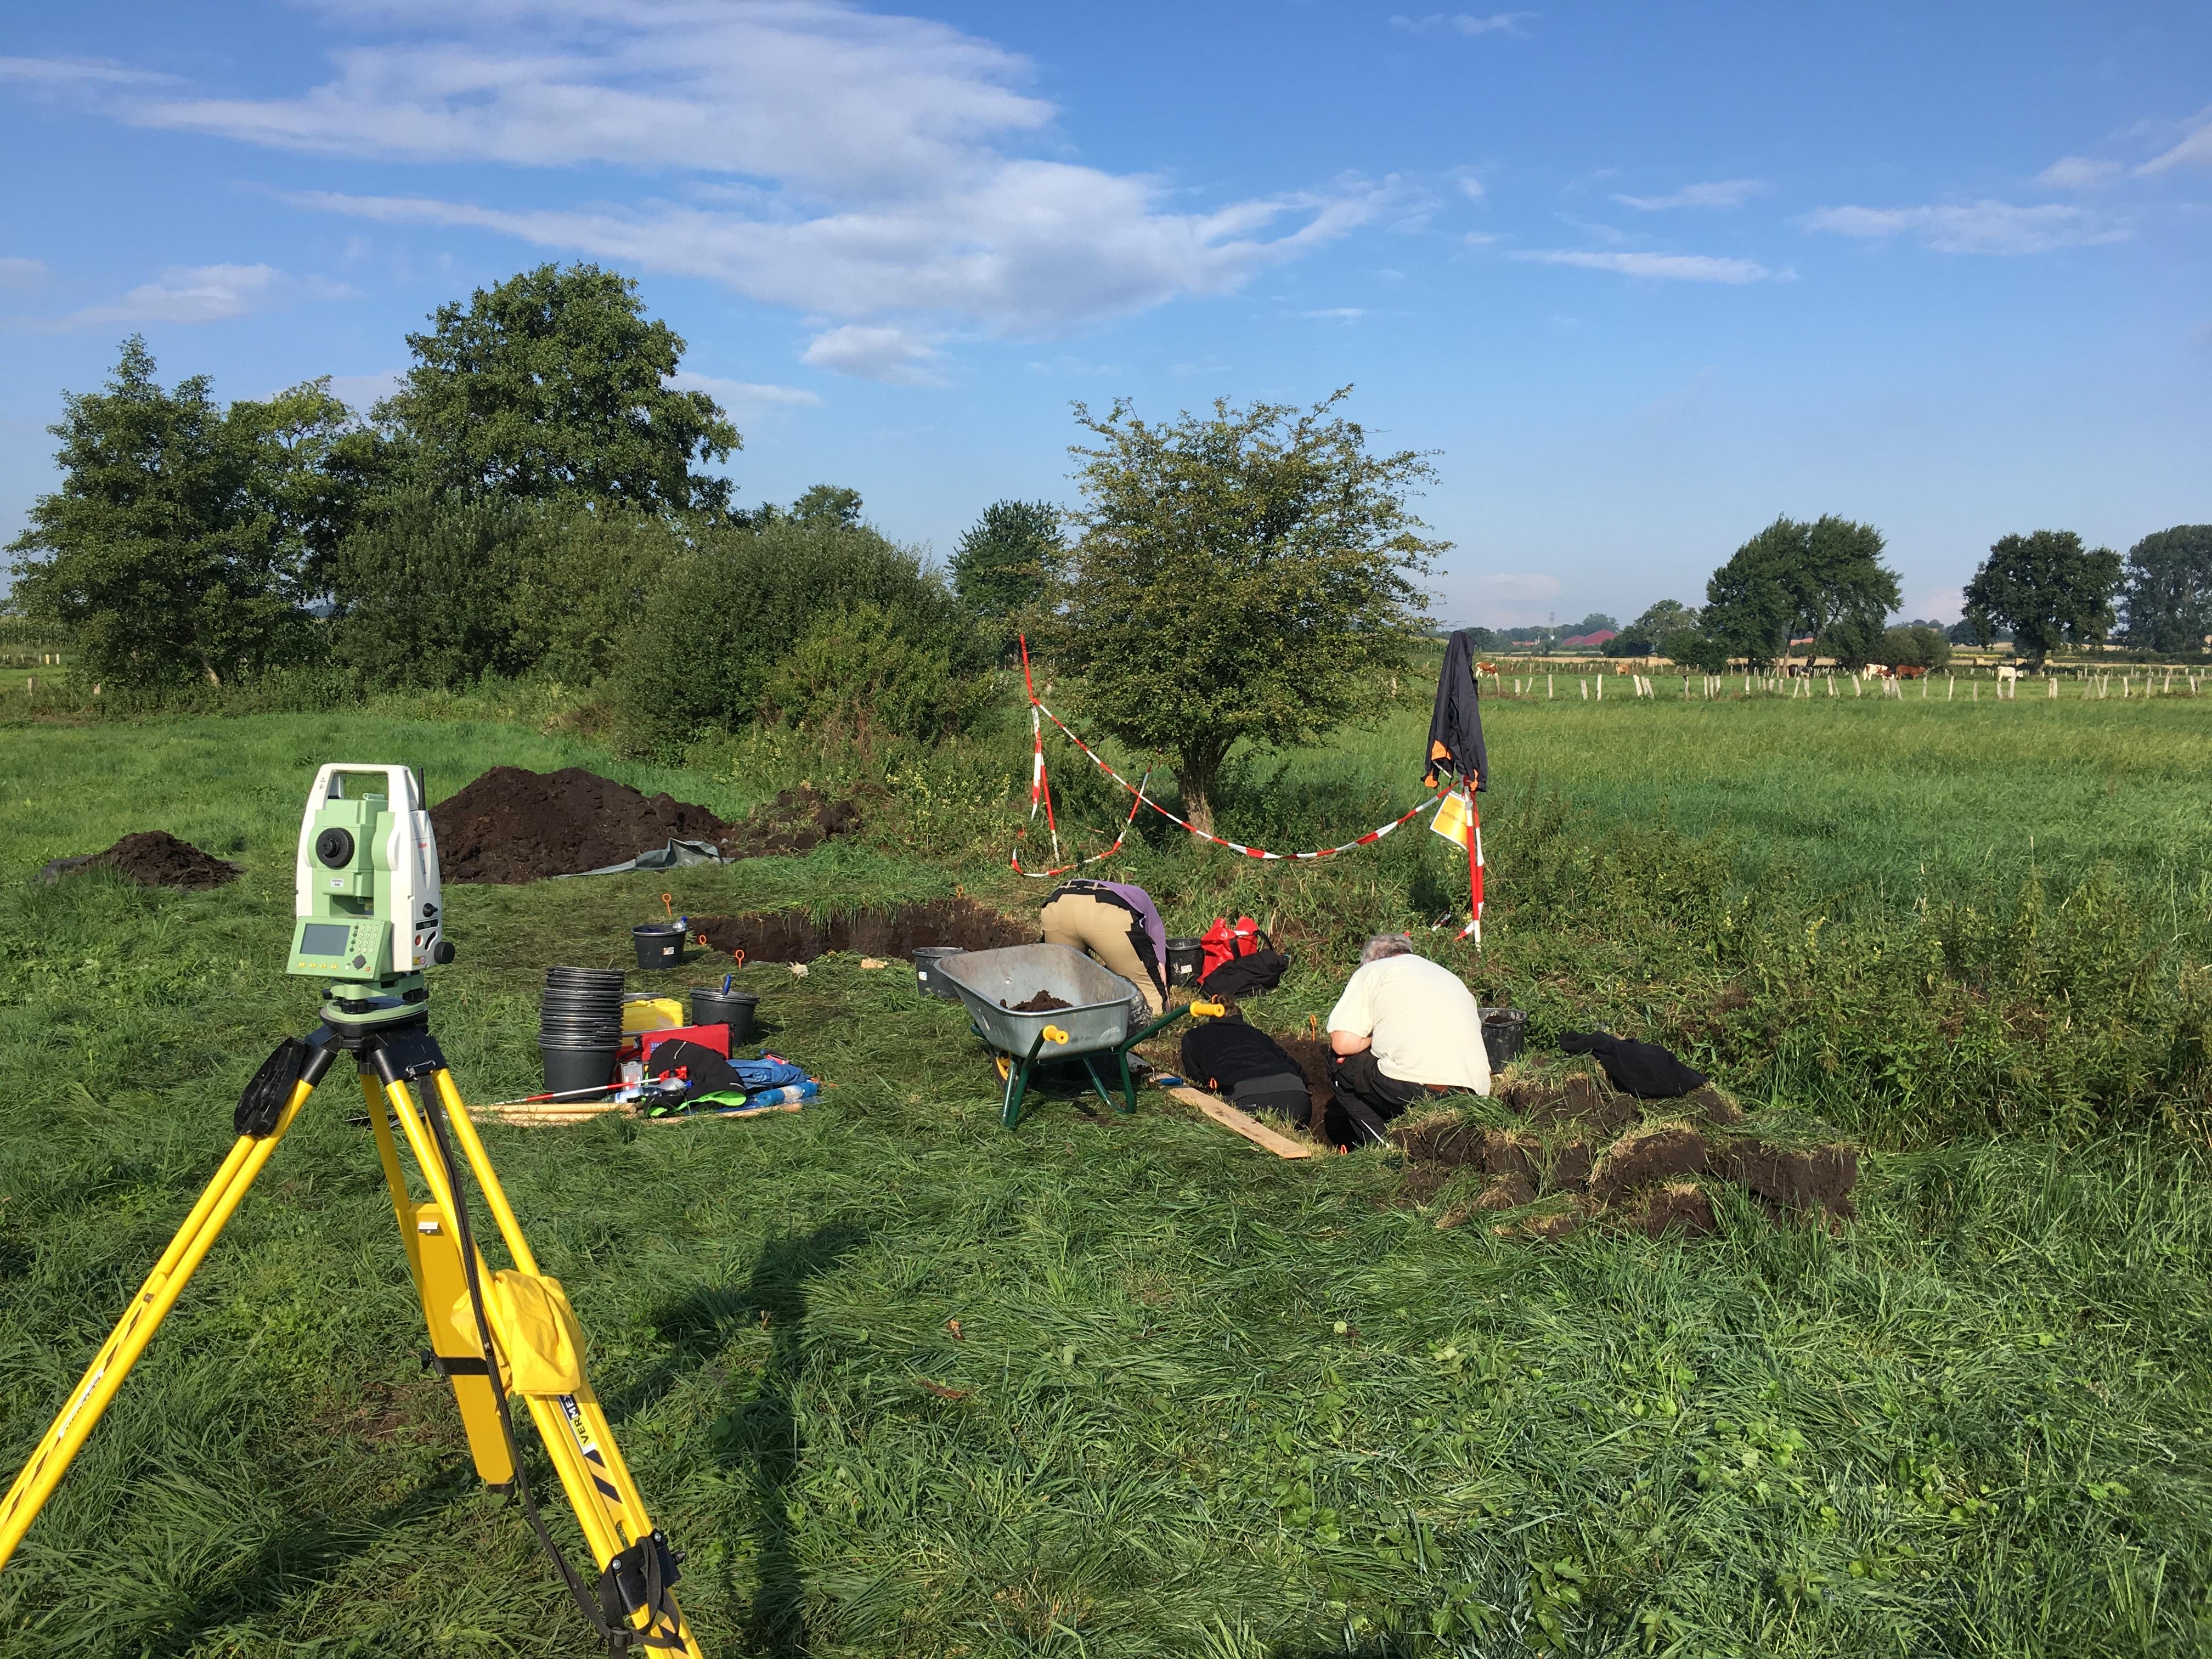 Test trenching at Duvensee